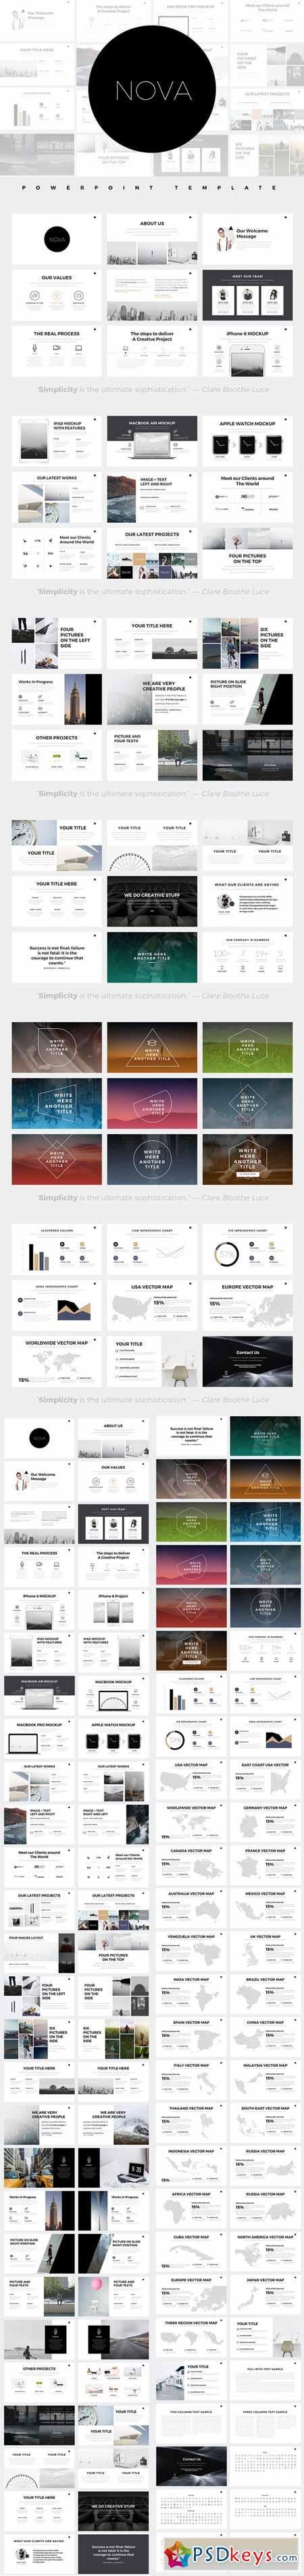 nova minimal powerpoint template 590639 design pinterest